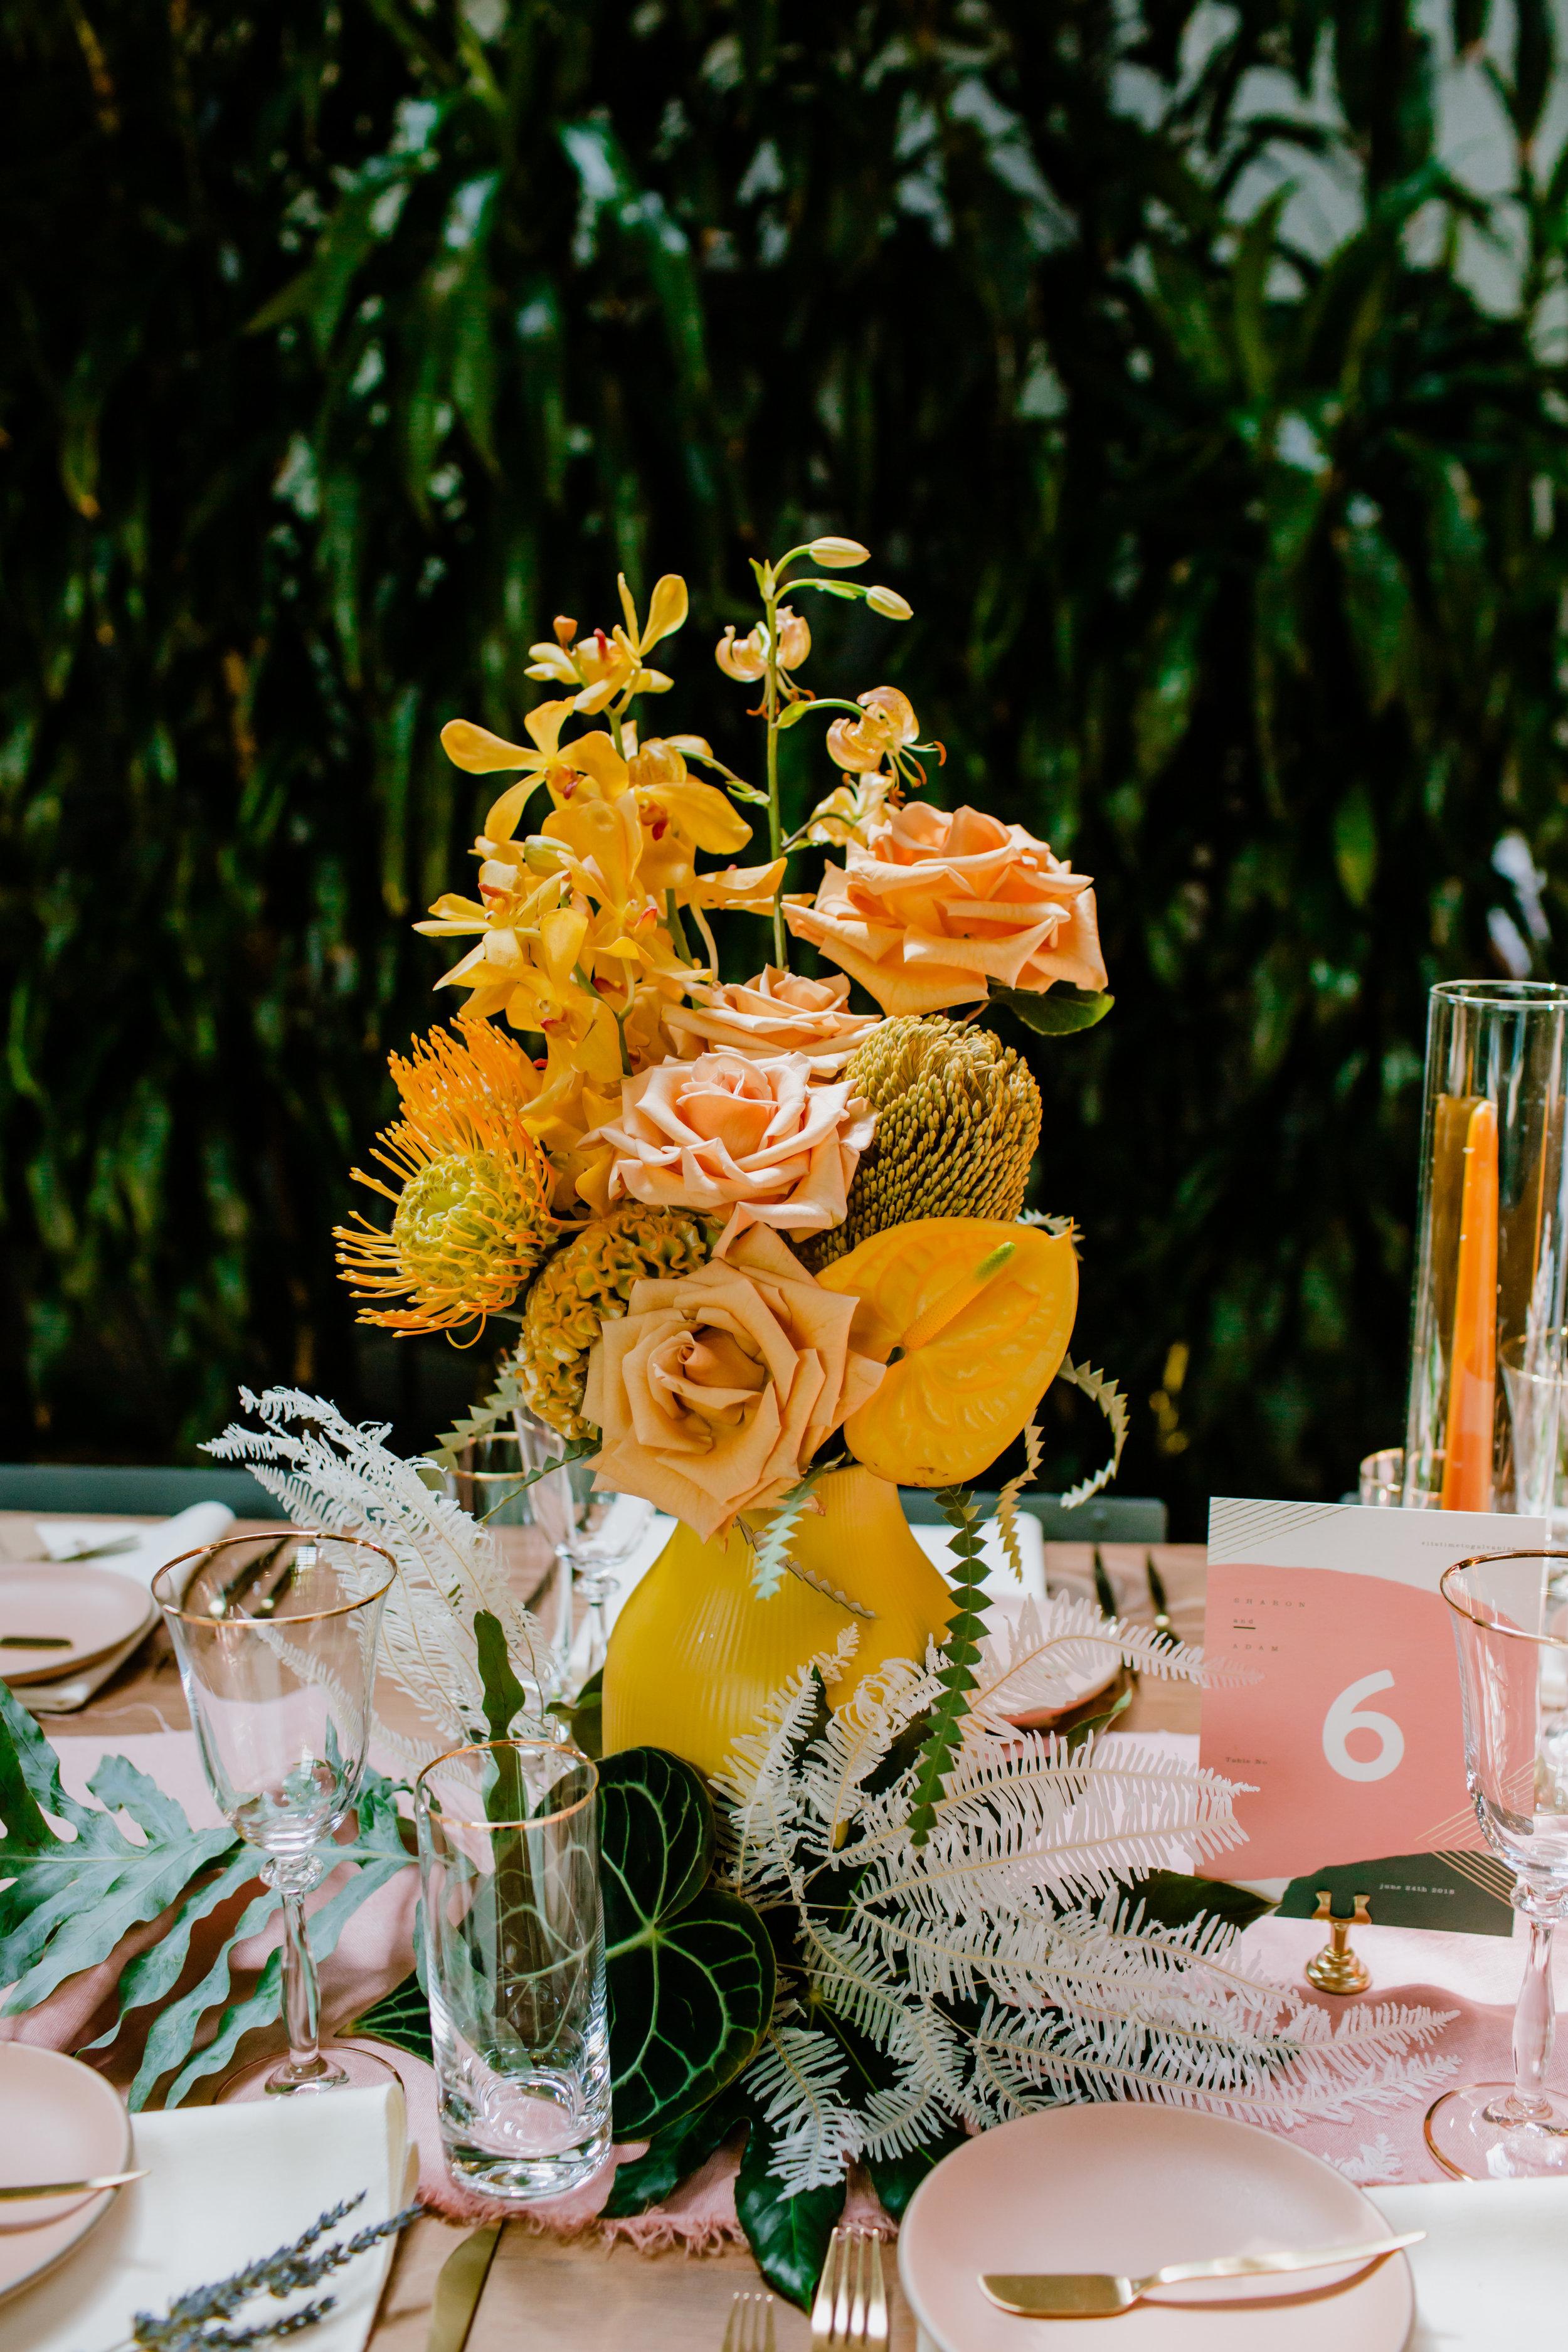 Sharon and Adam Downtown Los Angeles Arts District Wedding Millwick Venue - Eve Rox Photography-270.jpg